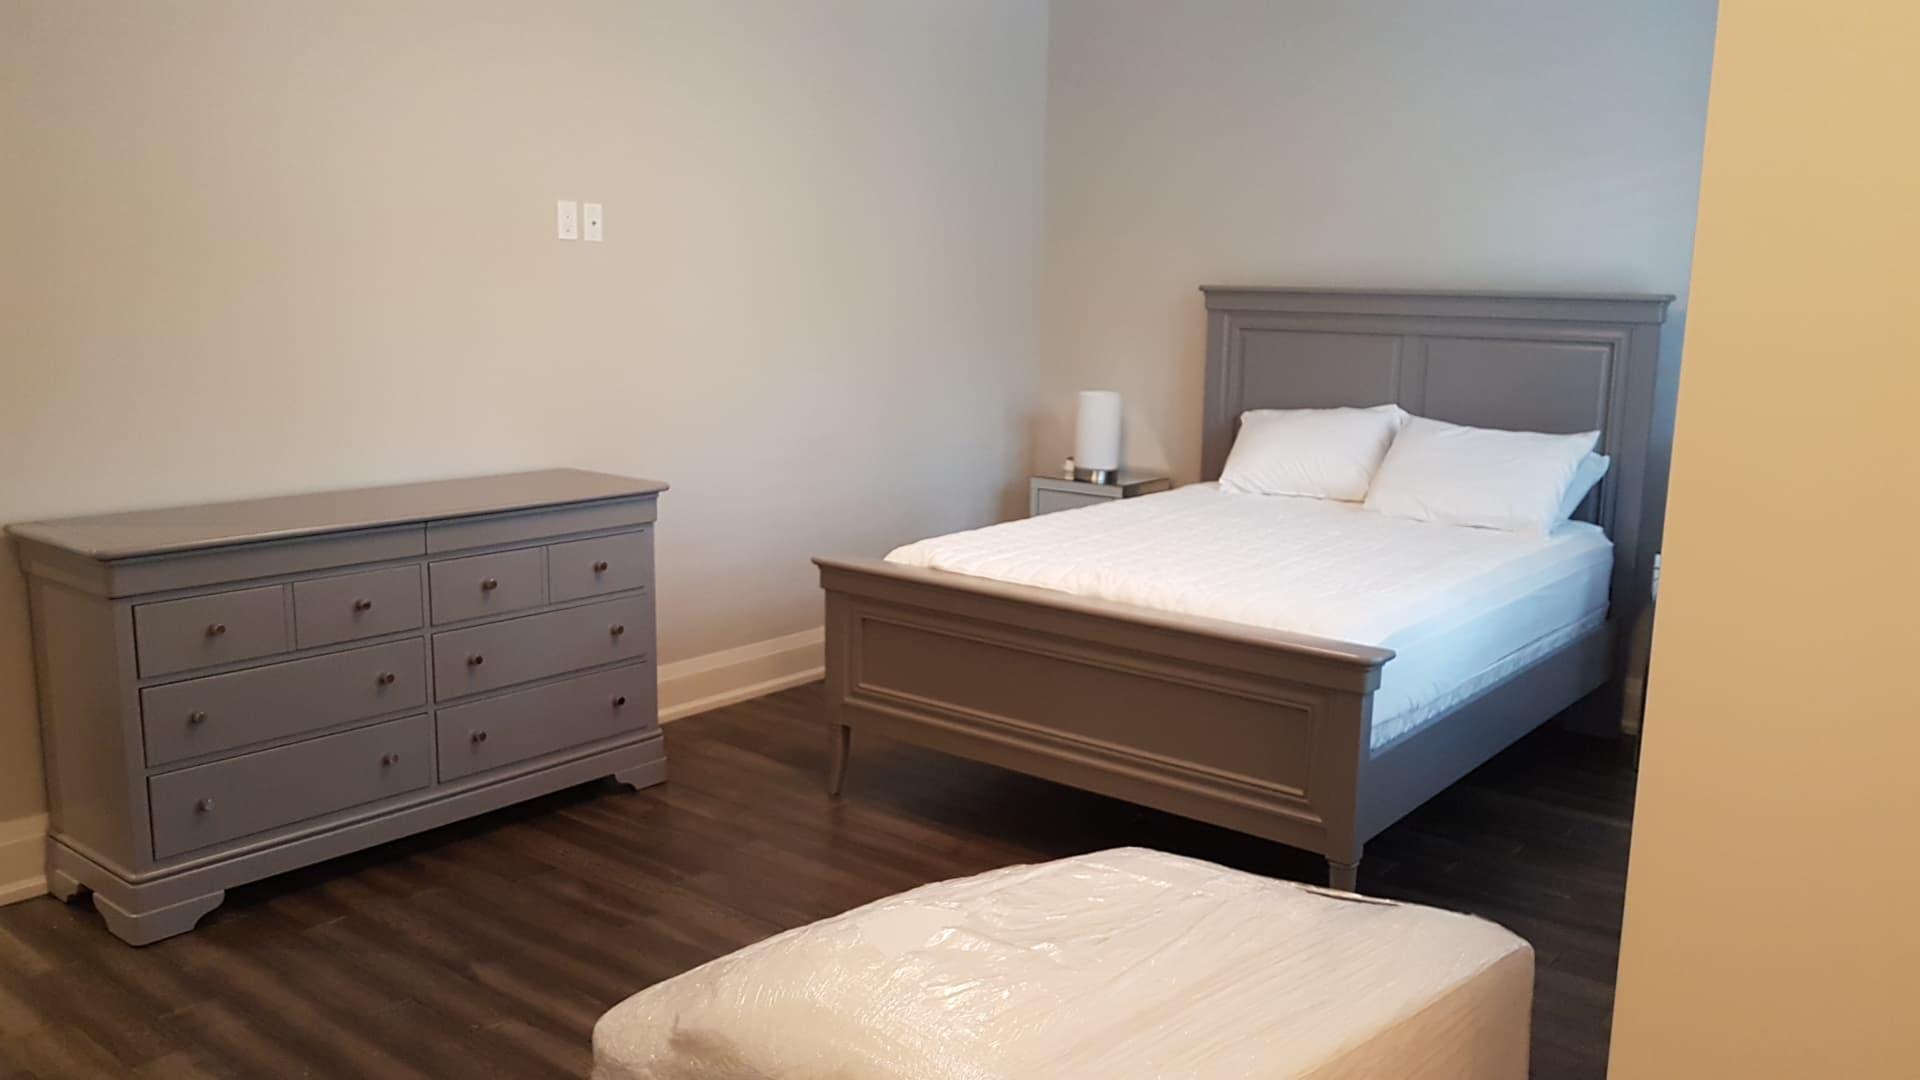 TUP Bedroom Sophia Batz Unionville July 219 2019   Boulder C5359.jpg